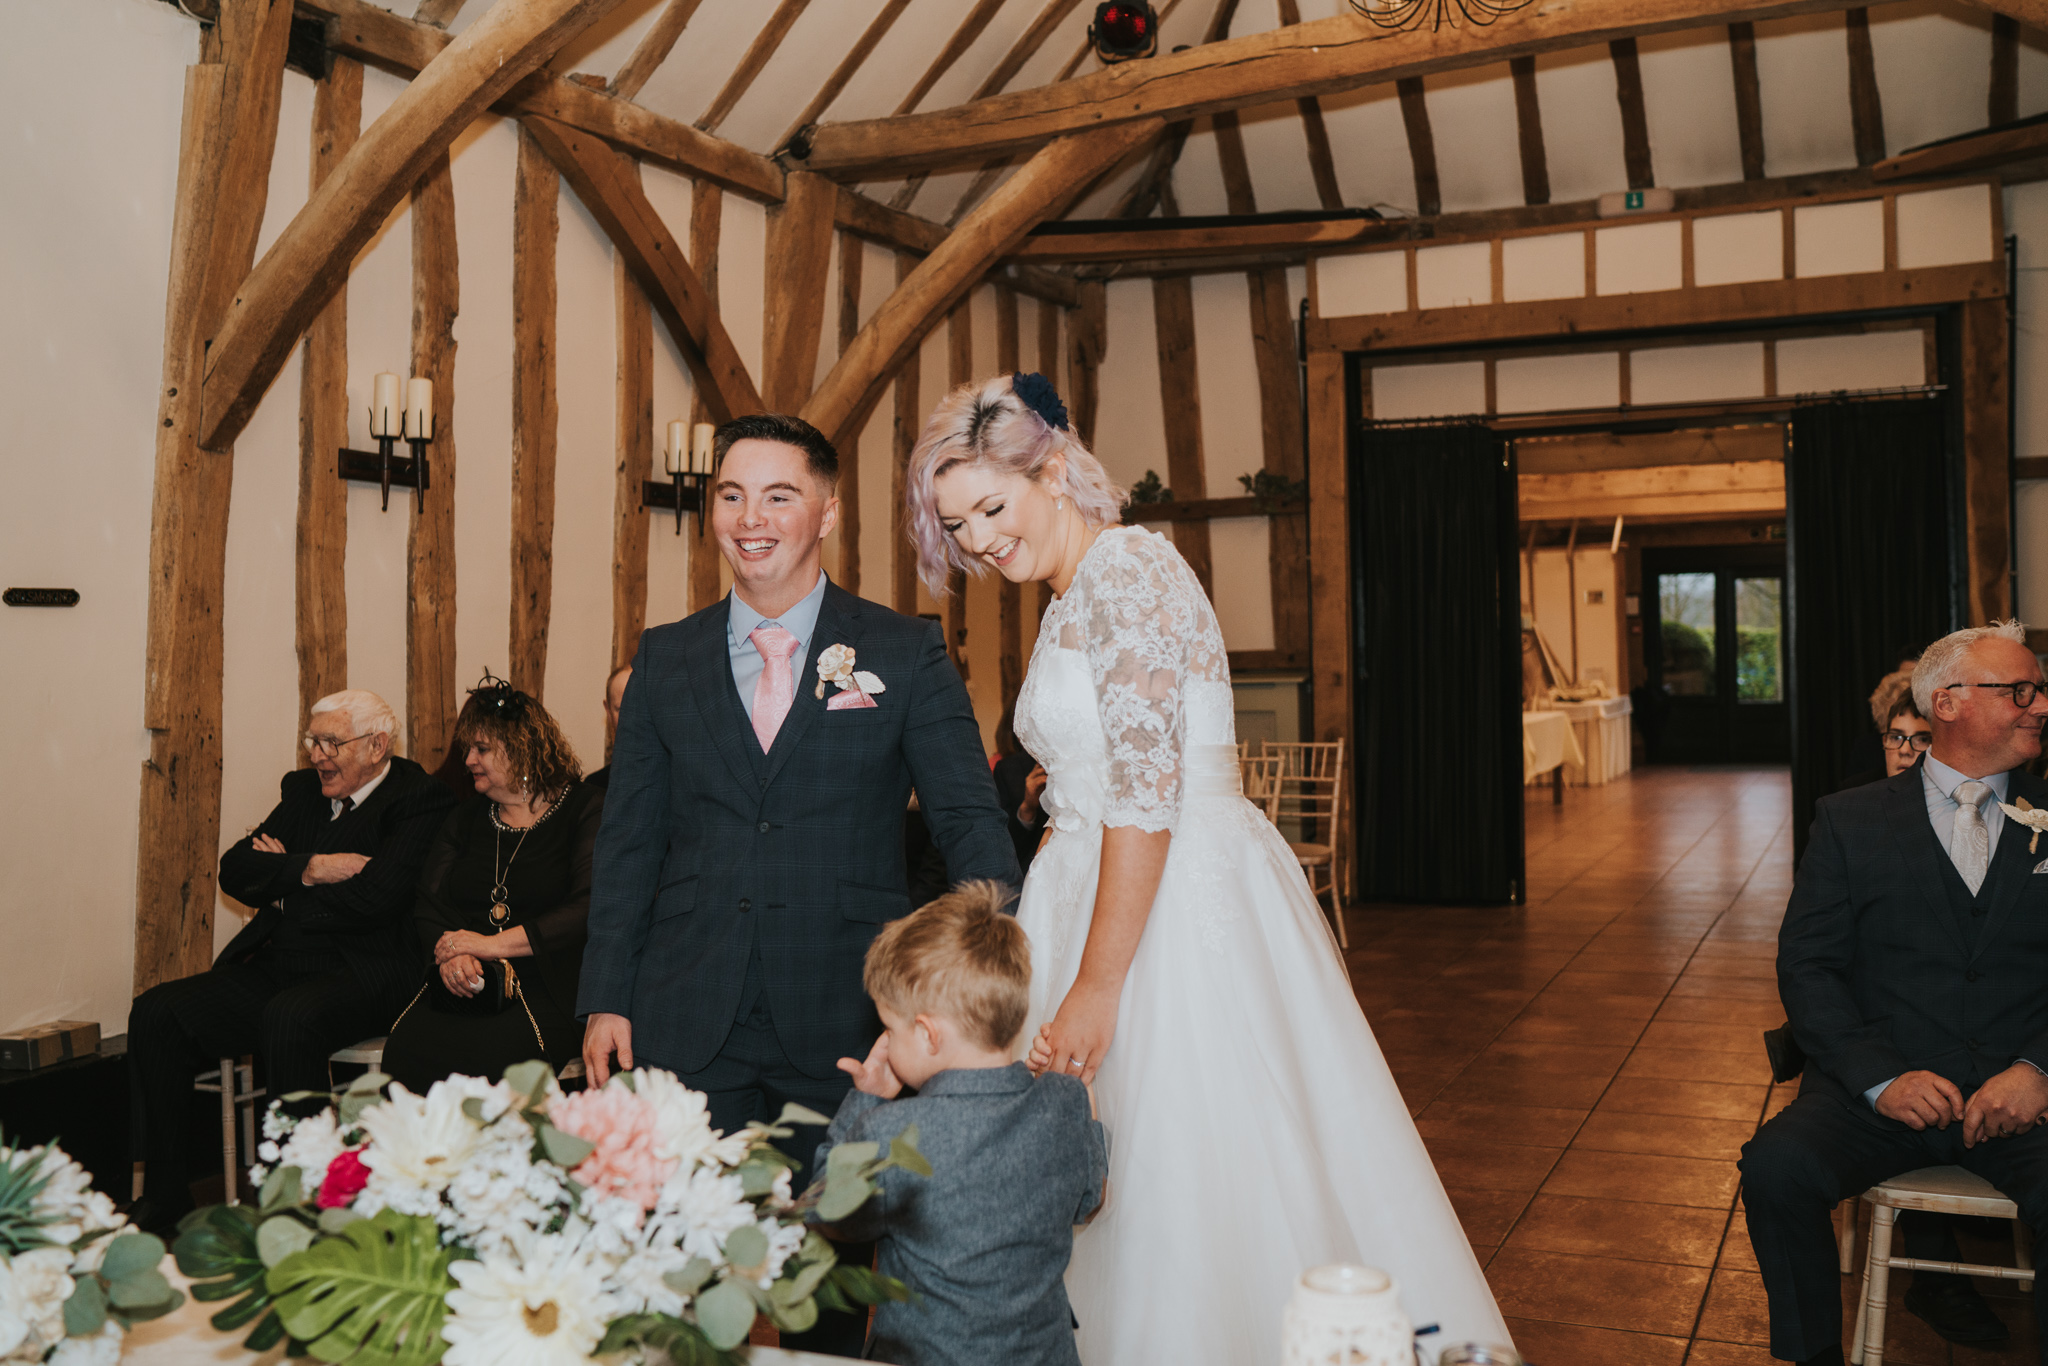 rhia-james-rustic-crabbs-barn-vintage-50s-retro-wedding-grace-elizabeth-colchester-essex-alternative-relaxed-wedding-family-photography-devon-suffolk-norfolk-essex (76 of 138).jpg